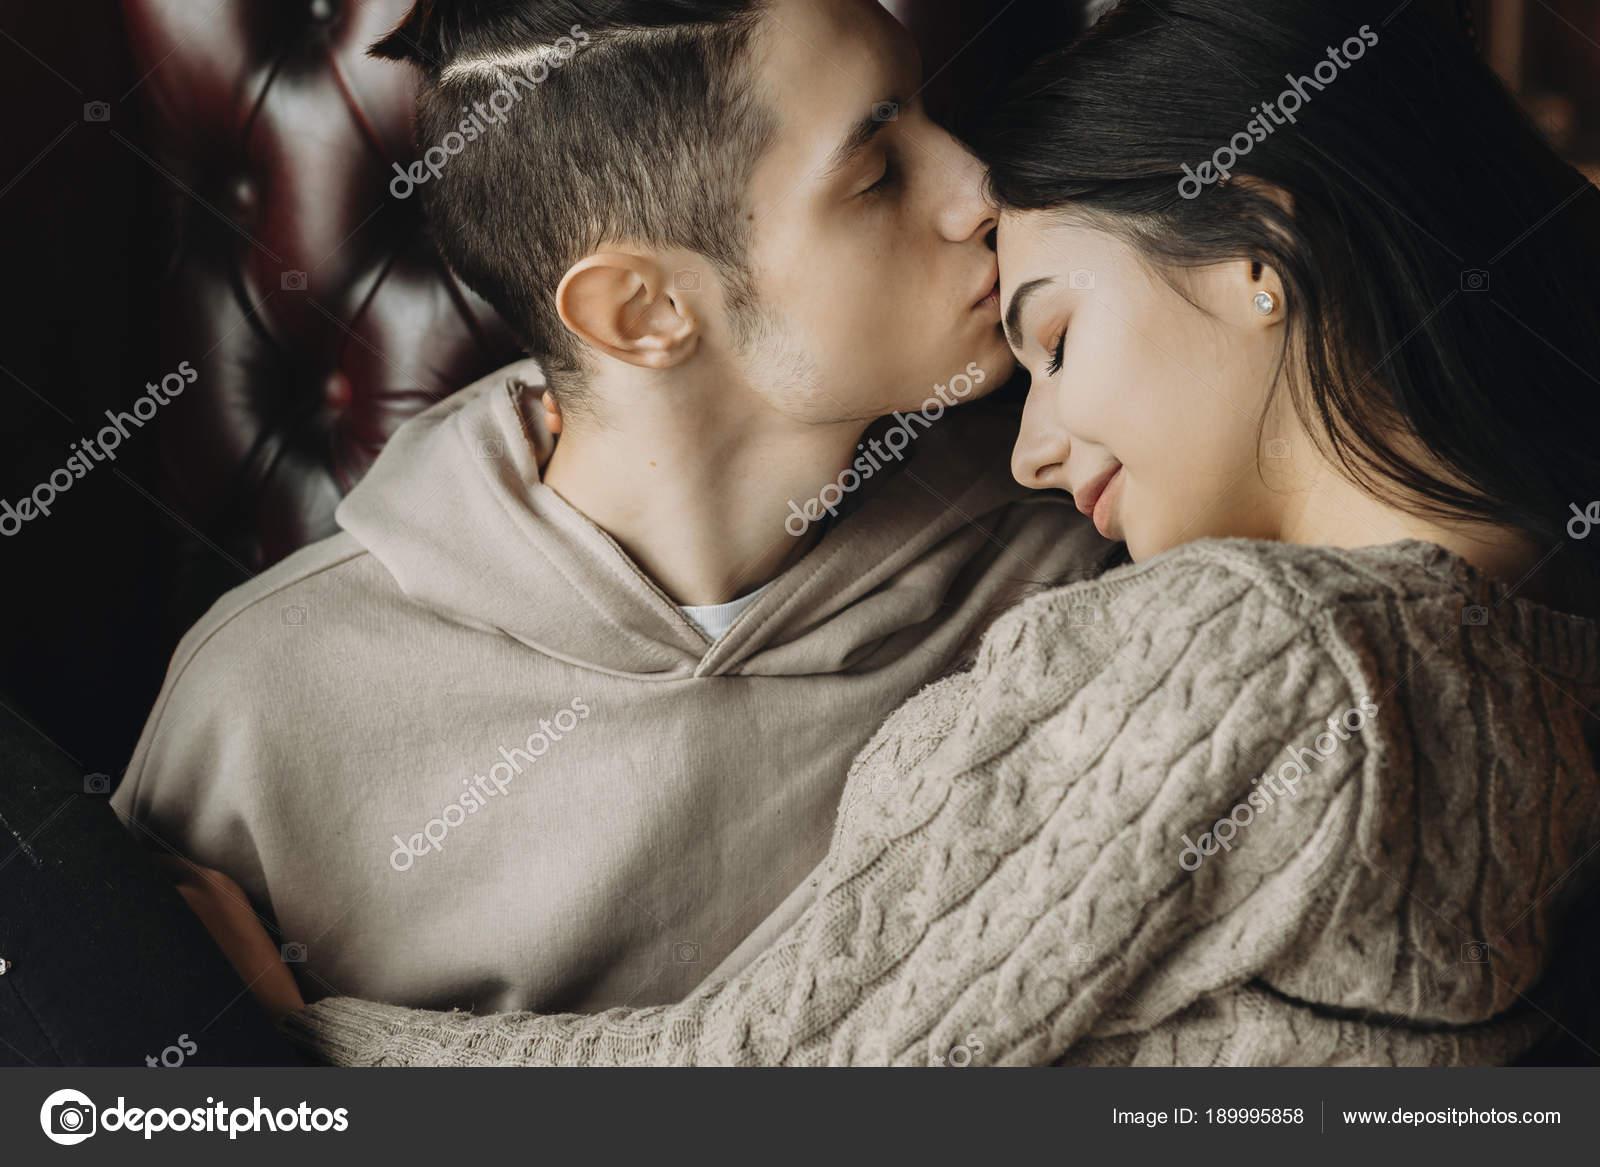 girl-young-sweet-couples